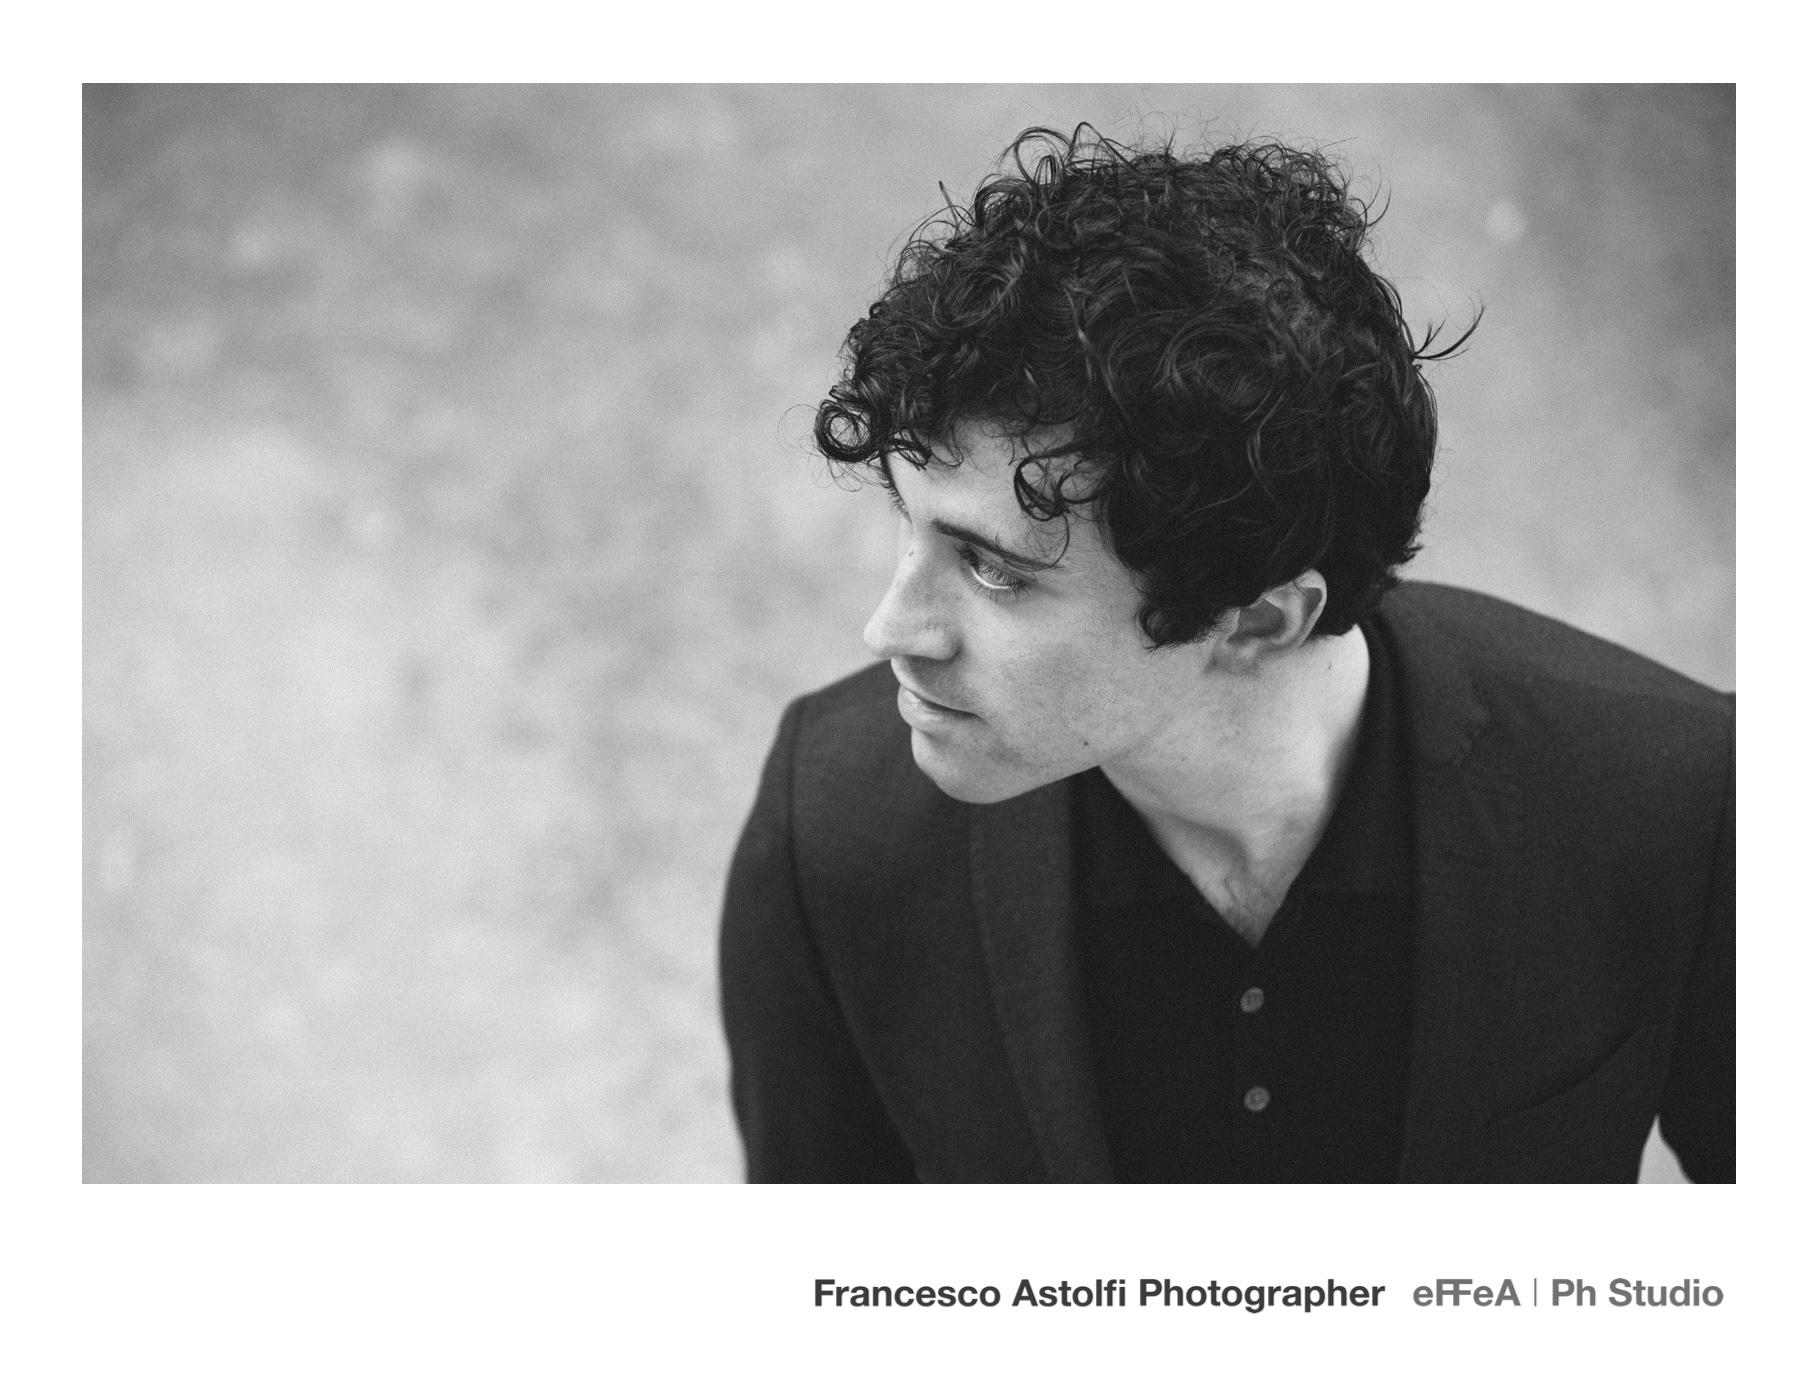 010 - Gentile Catone - Photo by Francesco Astolfi